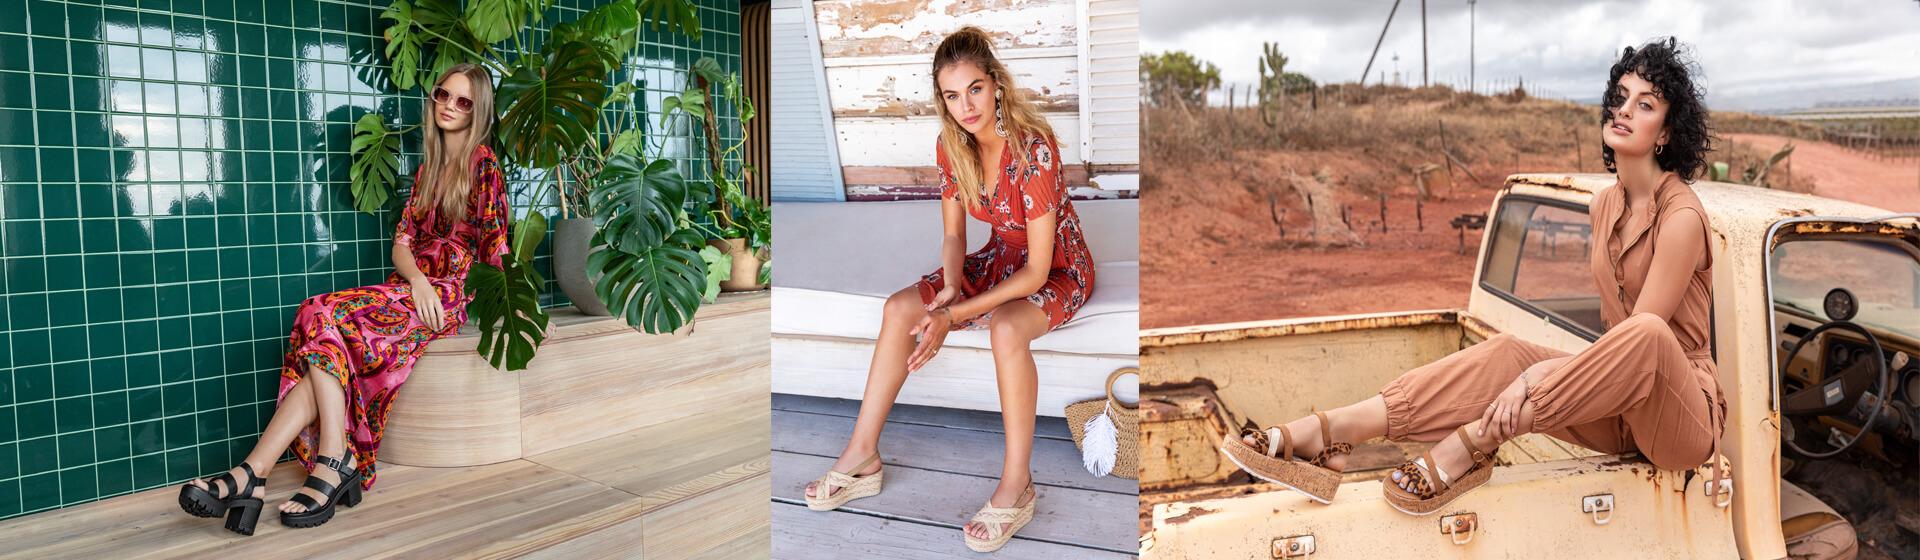 tendencias en sandalias planas con plataforma